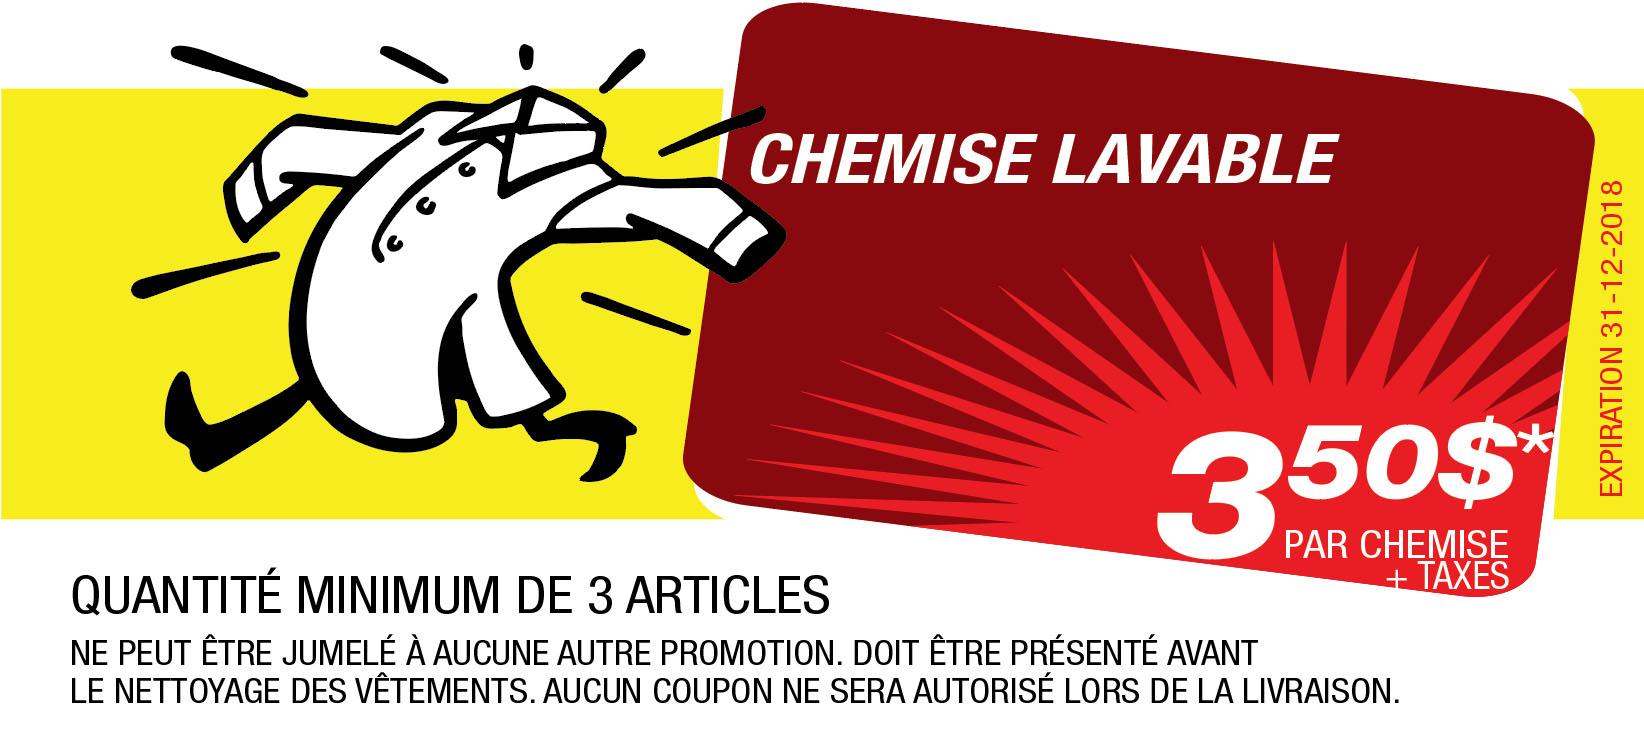 NettoyeurEclair-Chemise-Expiration31082018